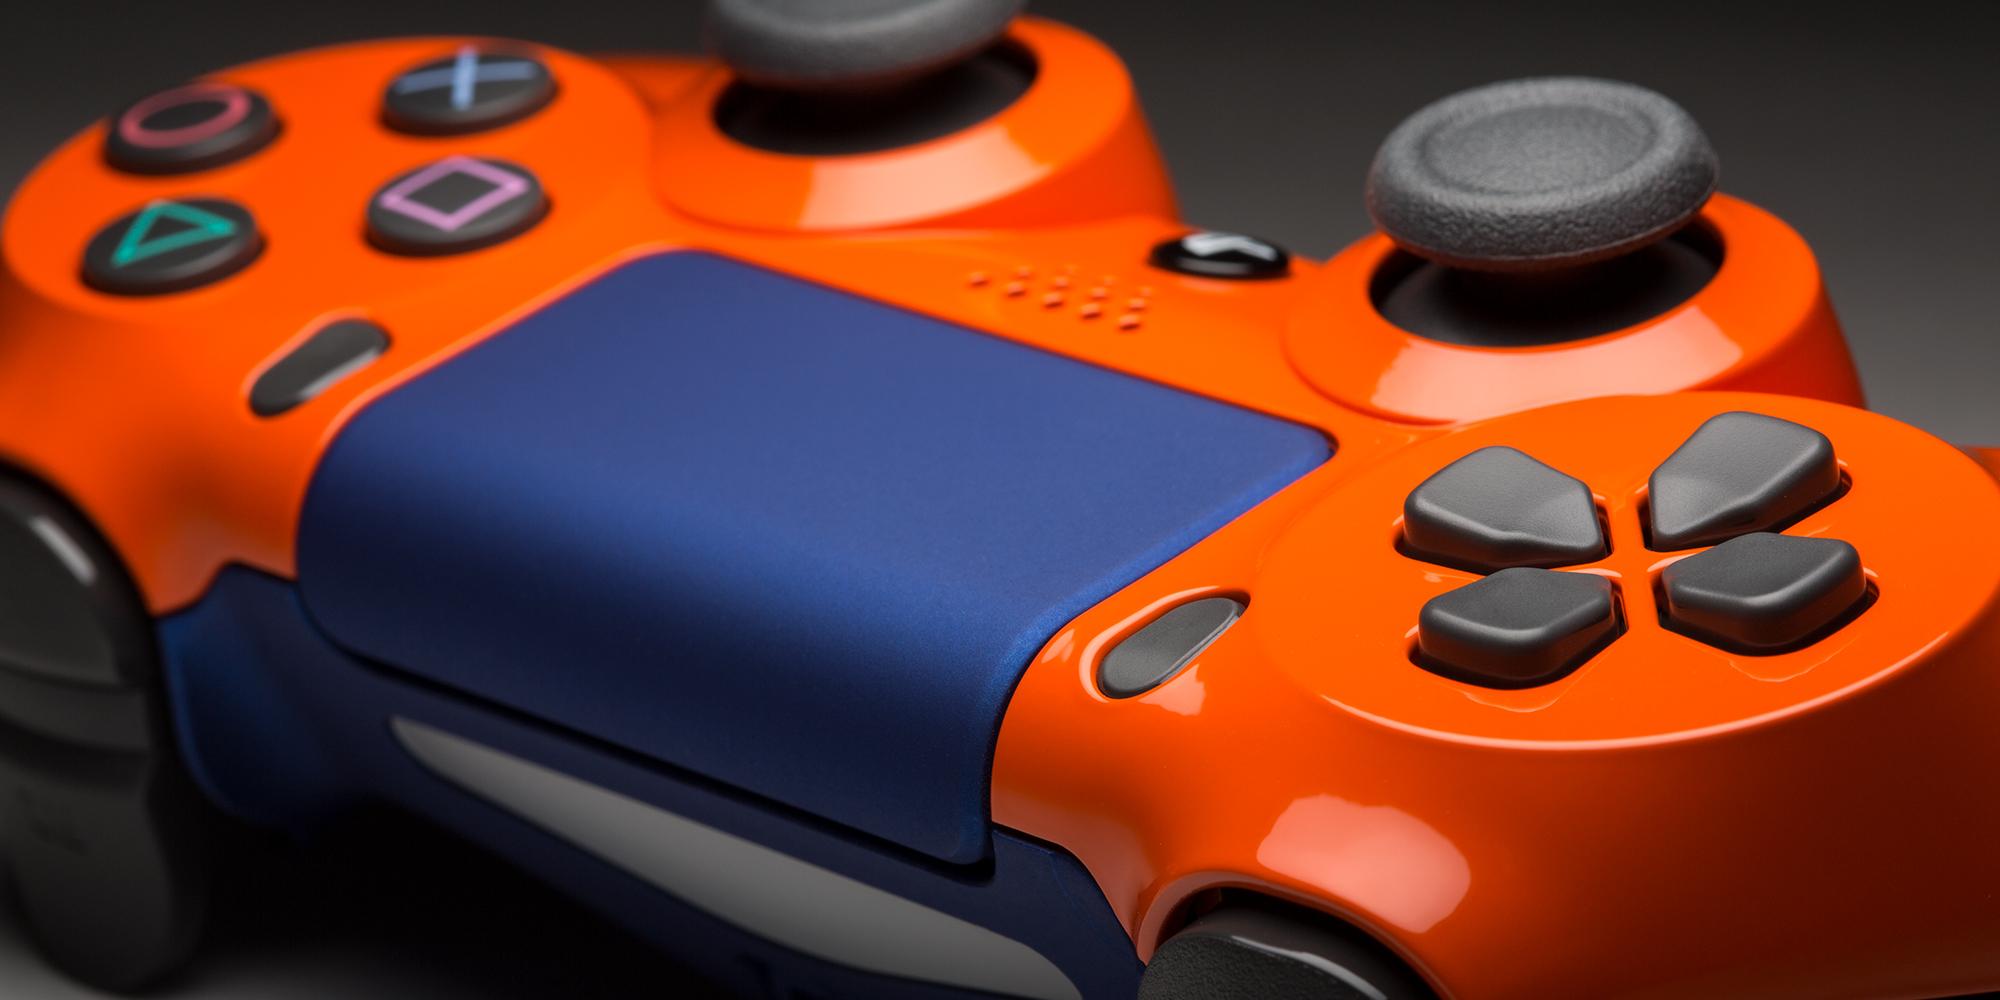 DUALSHOCK 4 | Custom PS4 Controllers | Colorware